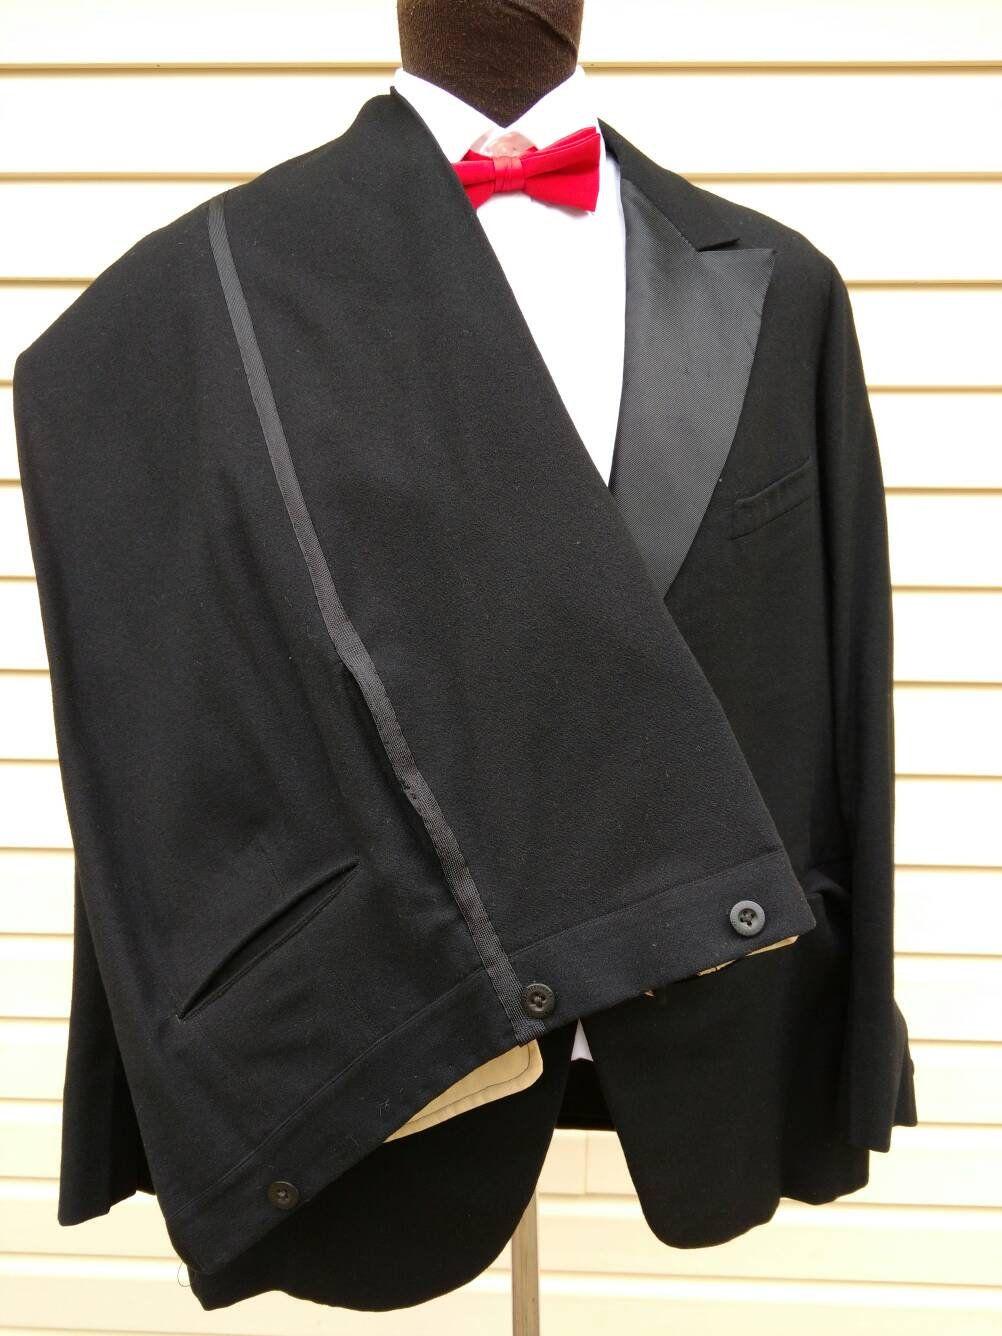 Vintage Mens Suit 1930 Tuxedo Suit Geo Hoelscher Berlin Jacket Pants By Alltheragevintageca On Etsy Tuxedo Suit Mens Tuxedo Suits Vintage Suit Men